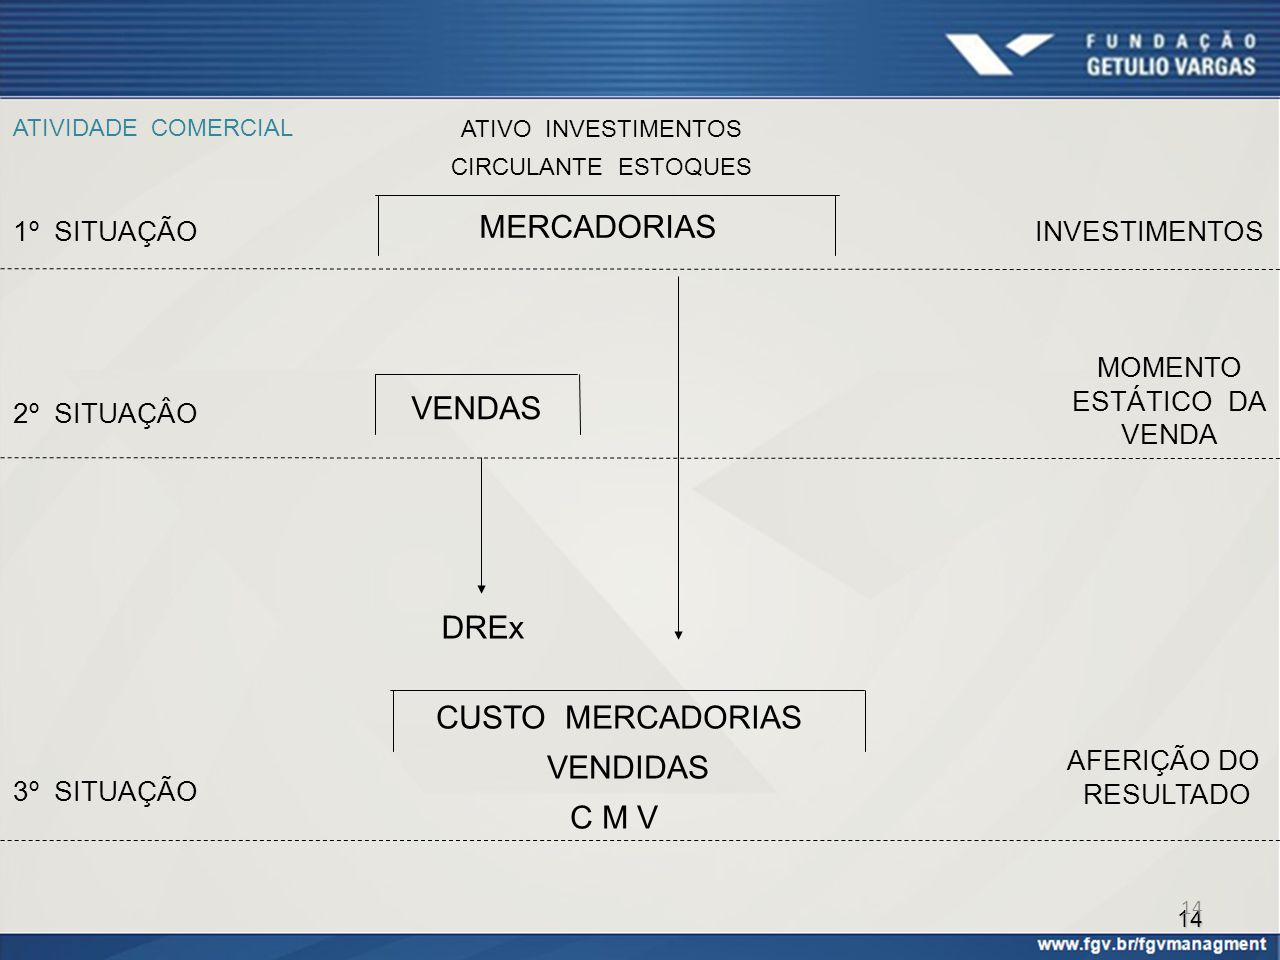 14 ATIVIDADE COMERCIAL ATIVO INVESTIMENTOS CIRCULANTE ESTOQUES MERCADORIAS VENDAS DREx CUSTO MERCADORIAS VENDIDAS C M V INVESTIMENTOS MOMENTO ESTÁTICO